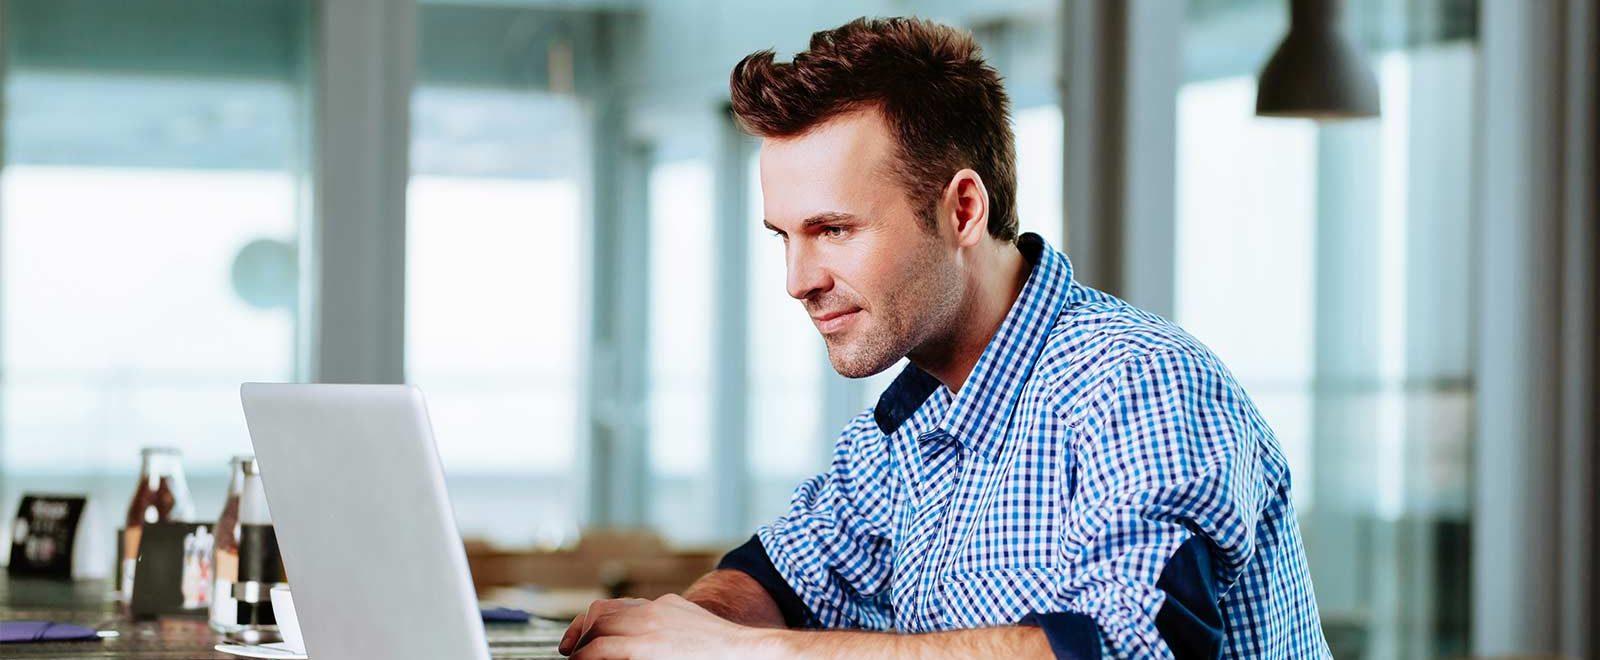 Creare business online